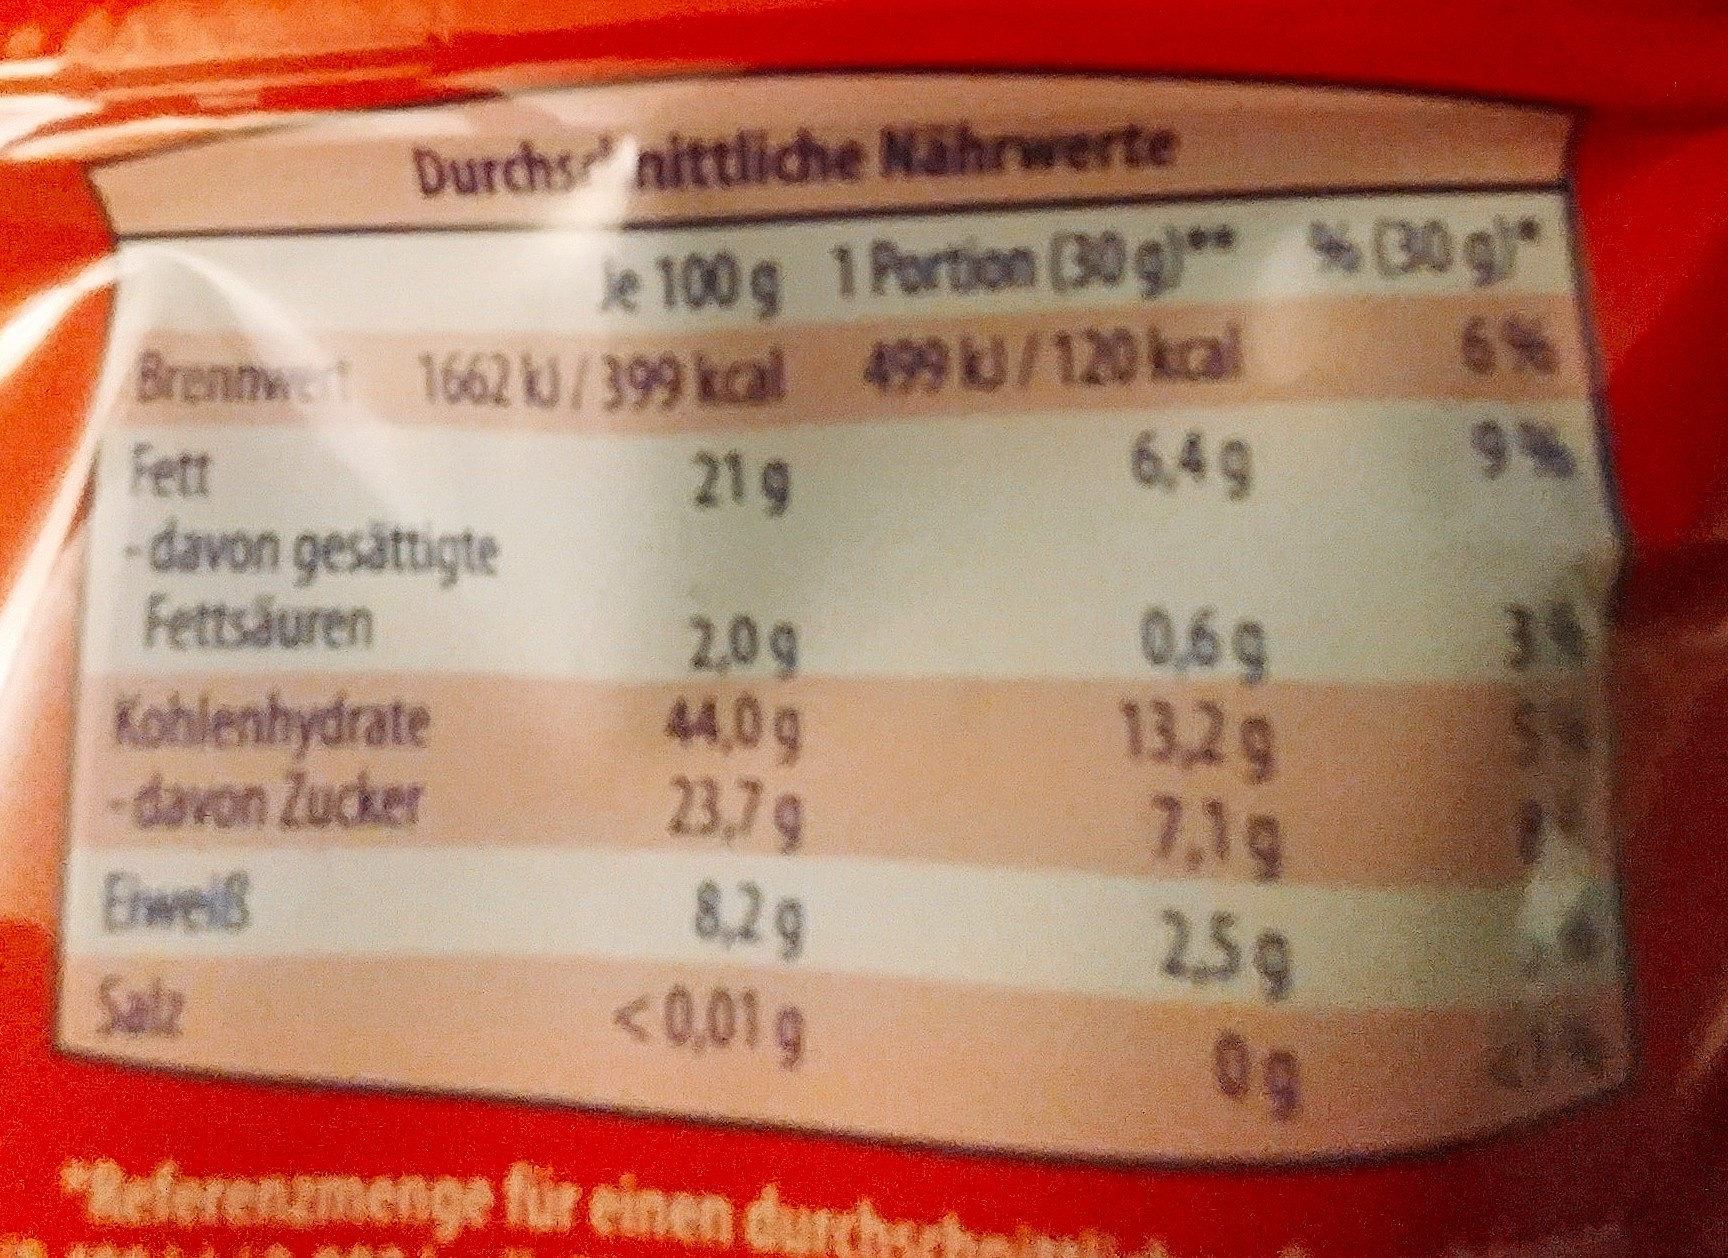 Frucht- Nuss- Mischung Pflaumen/Wallnusskerne - Nutrition facts